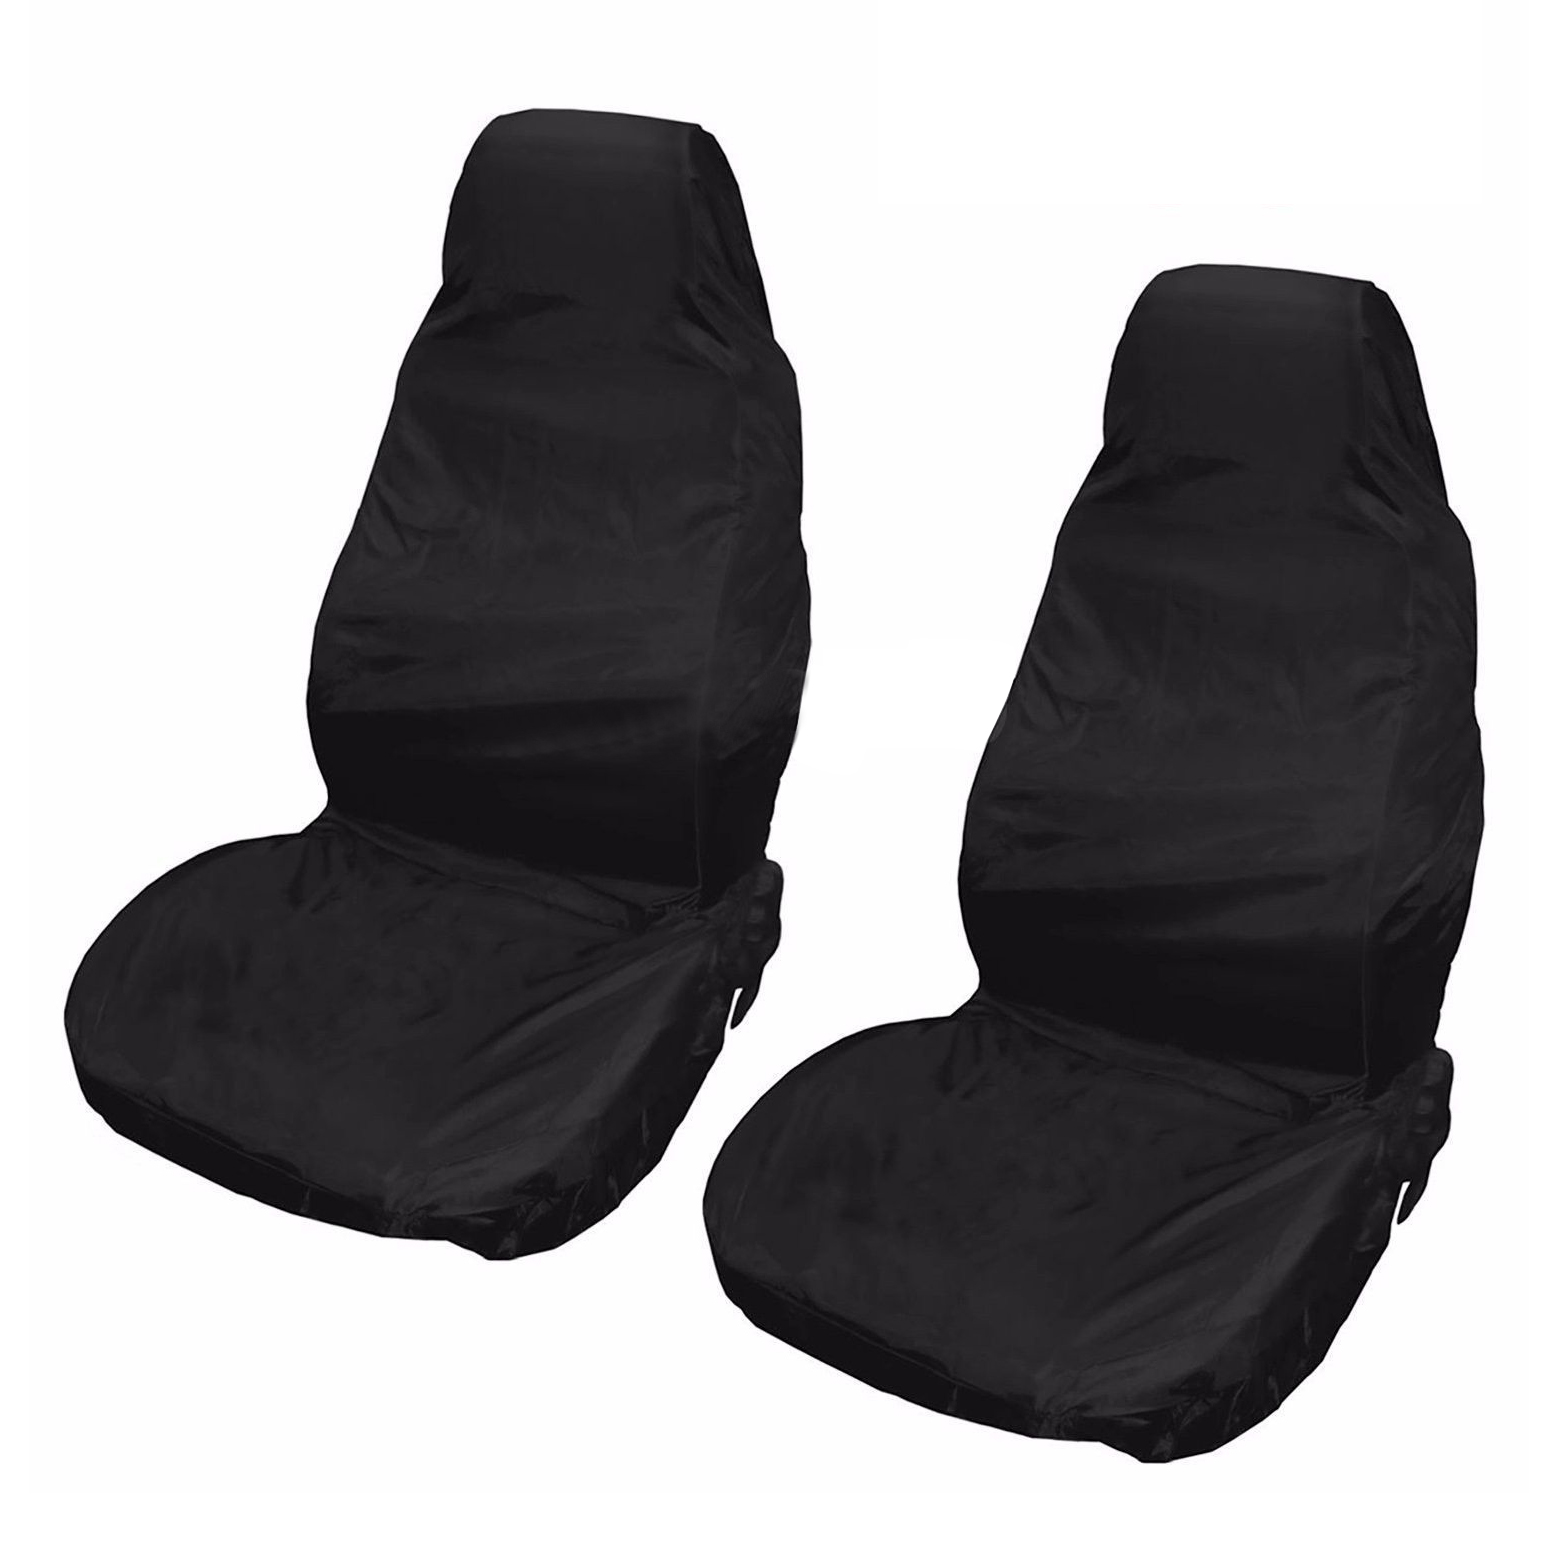 2x Universal Waterproof Nylon Front Car Van Seat Covers Protectors Black Pair